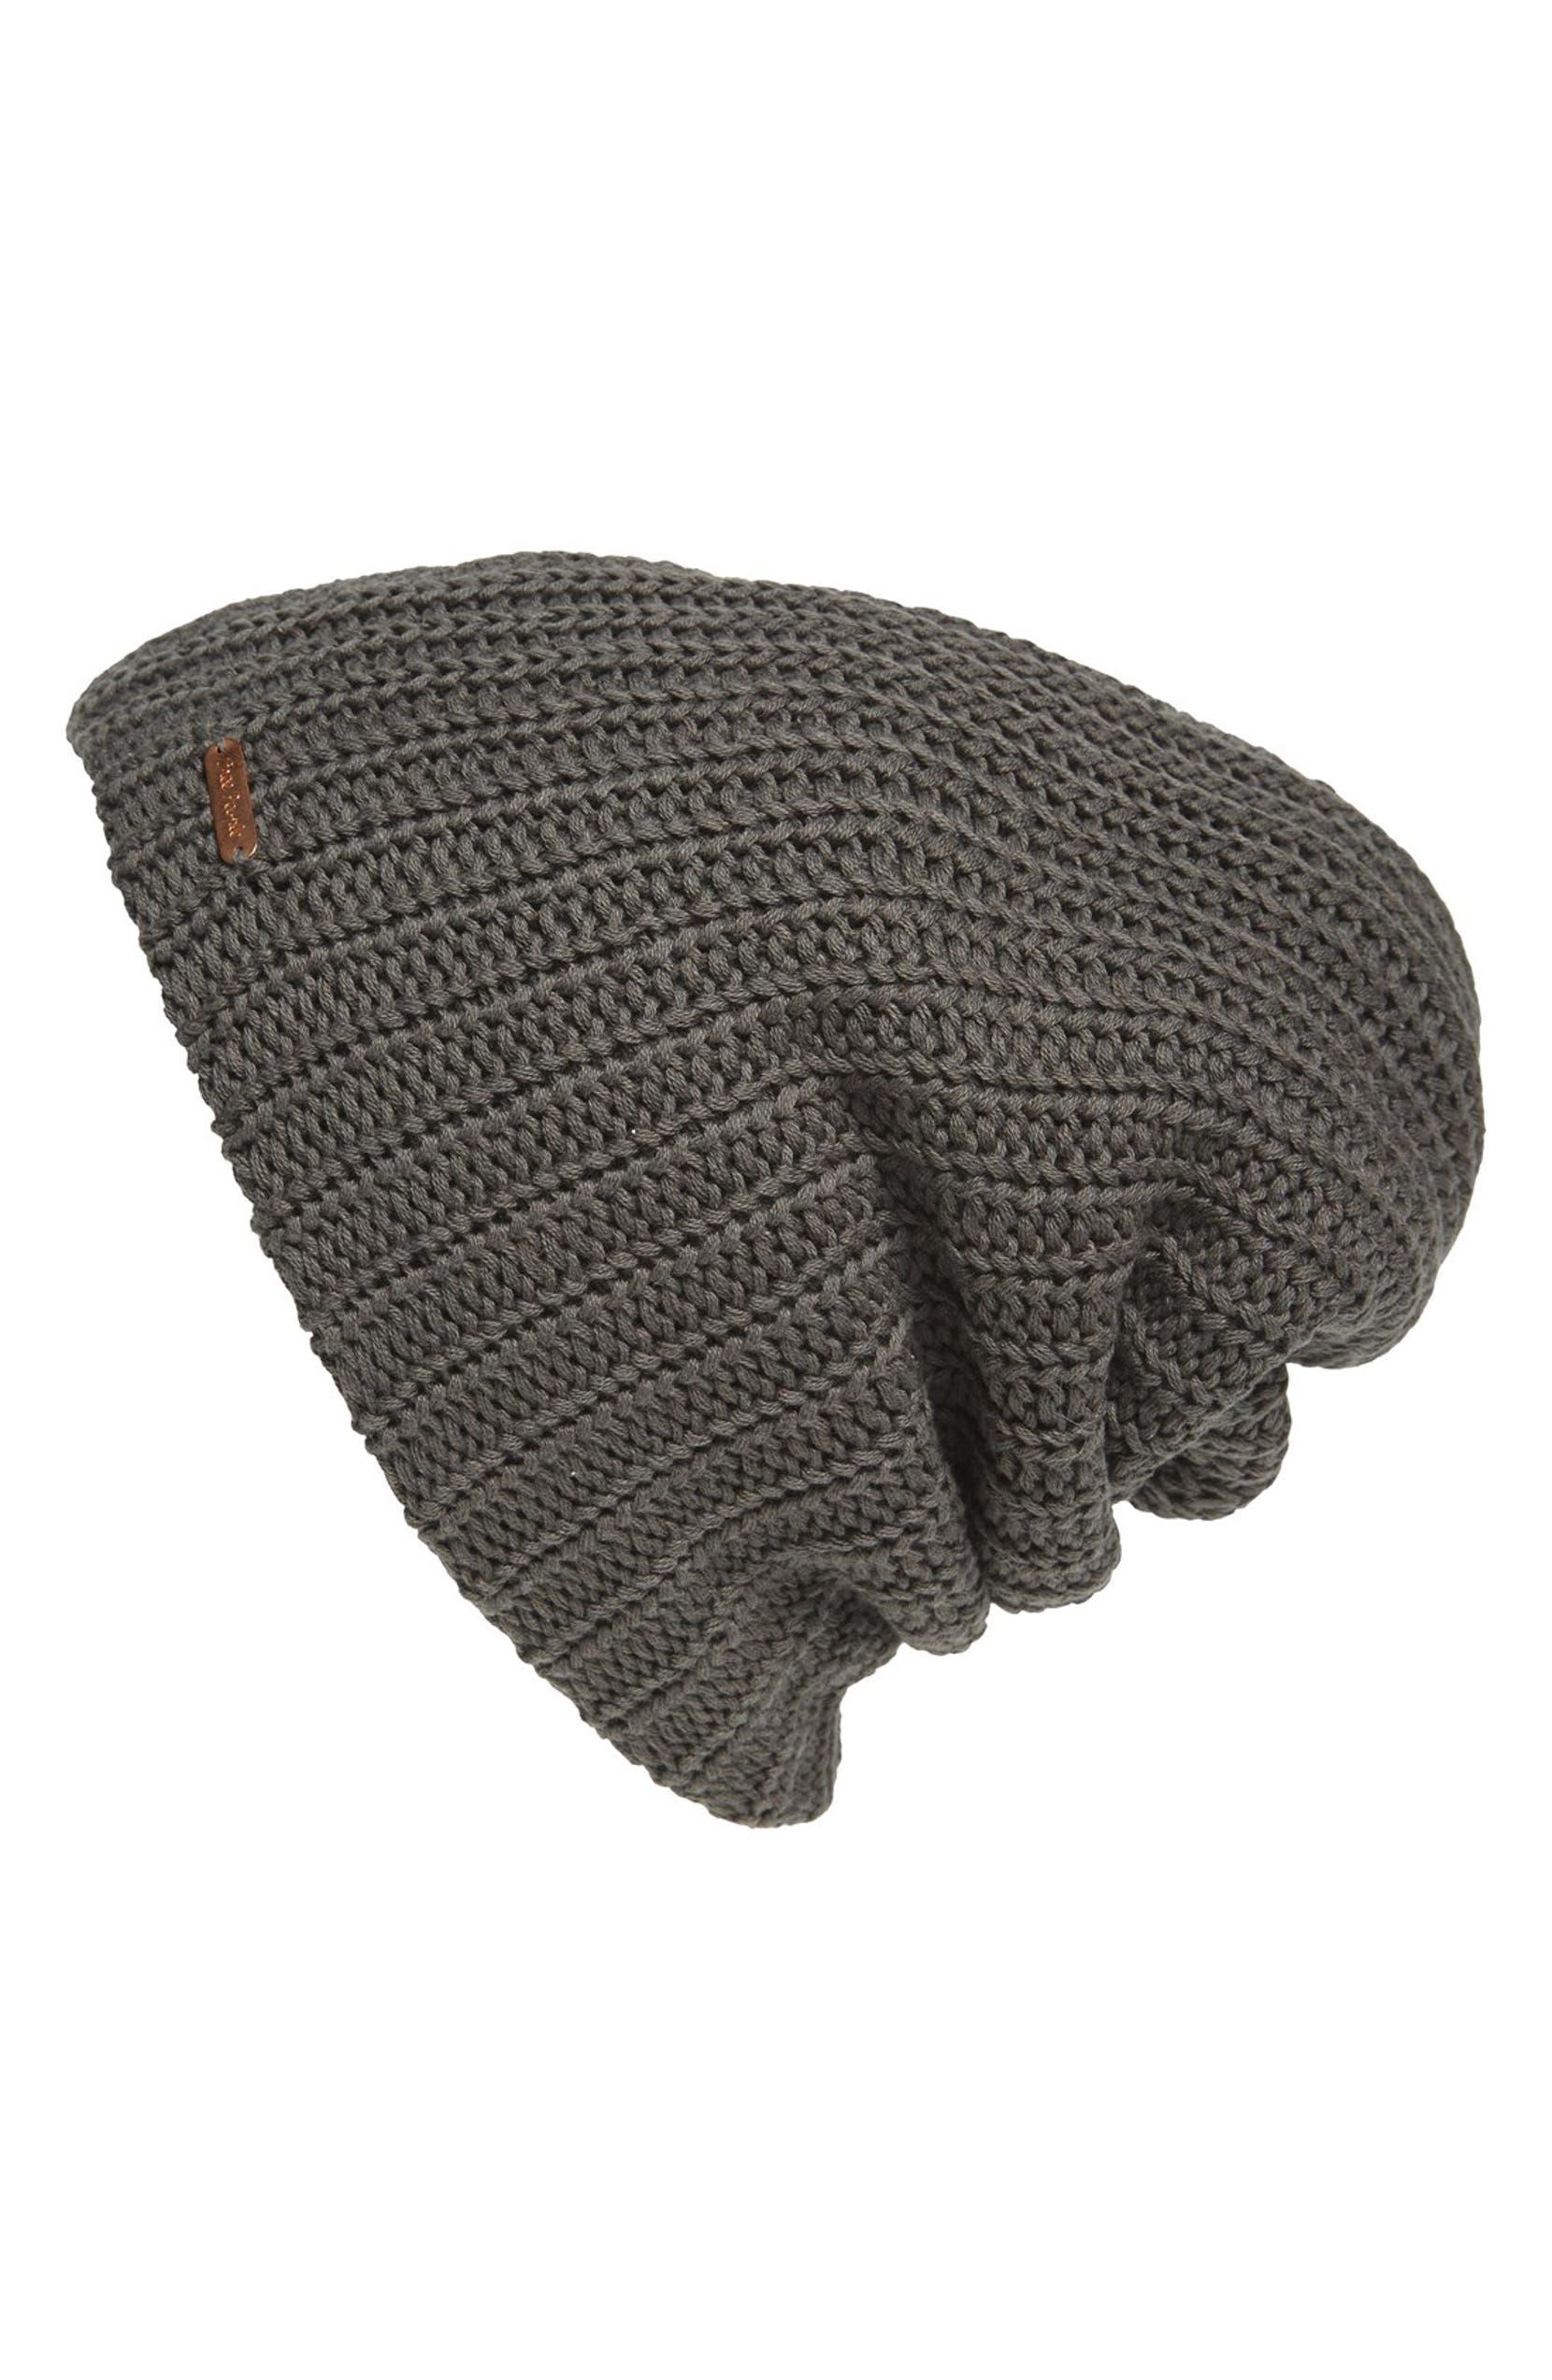 Free People  Capsule  Slouchy Knit Beanie  aca17f09721d